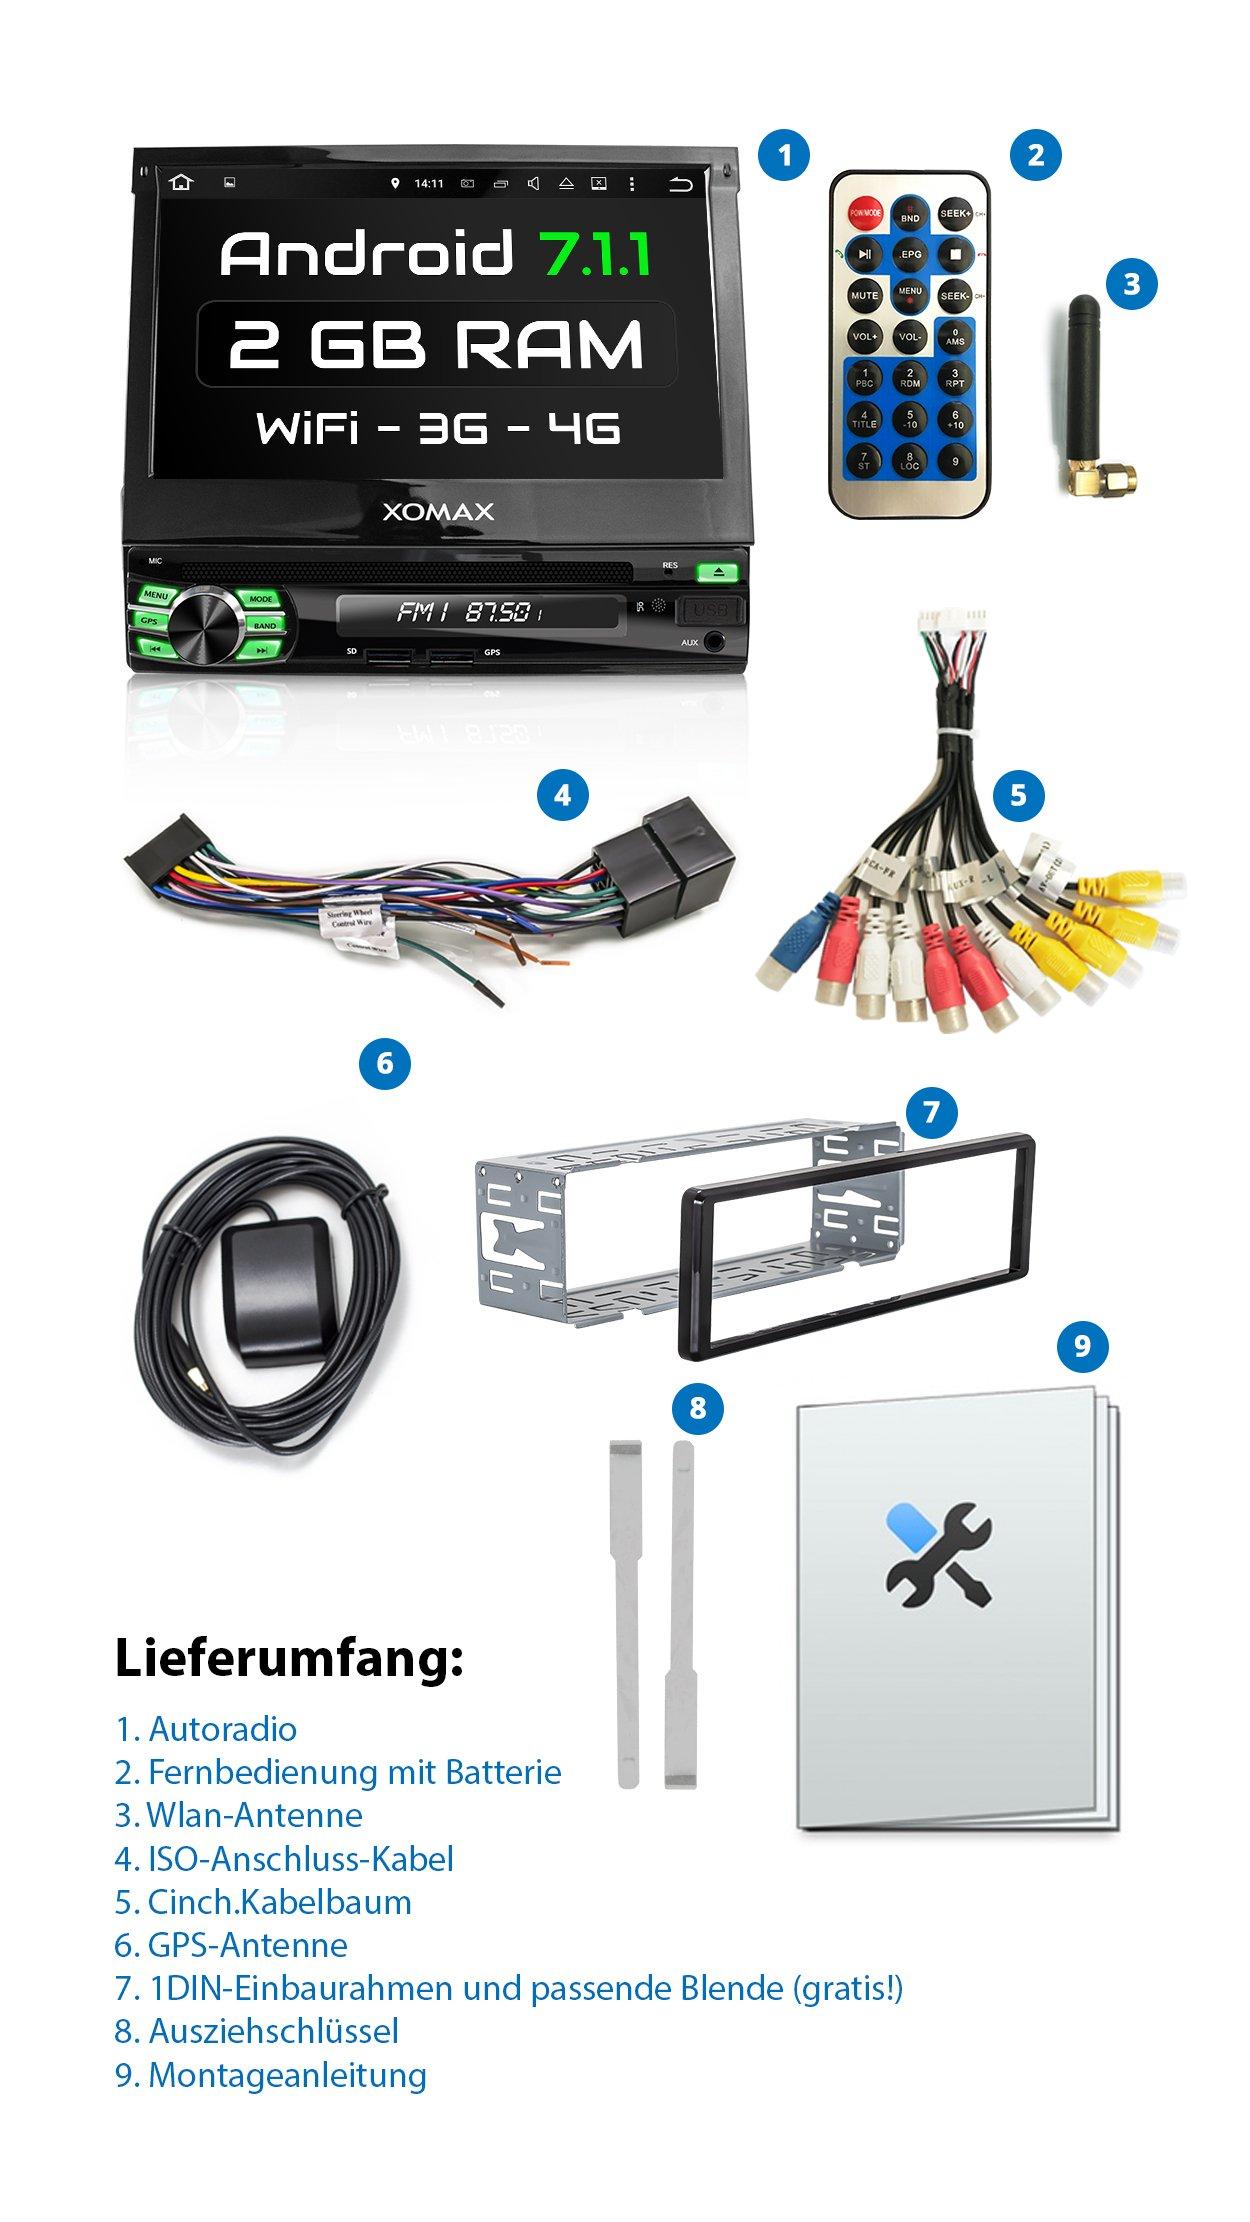 XOMAX-XM-DA708-Autoradio-mit-Android-711-2GB-RAM-Quad-Core-I-WiFi-3G-DAB-OBD2-Support-I-GPS-Navigation-Bluetooth-I-7-18-cm-Touchscreen-I-DVD-CD-USB-SD-I-1-DIN